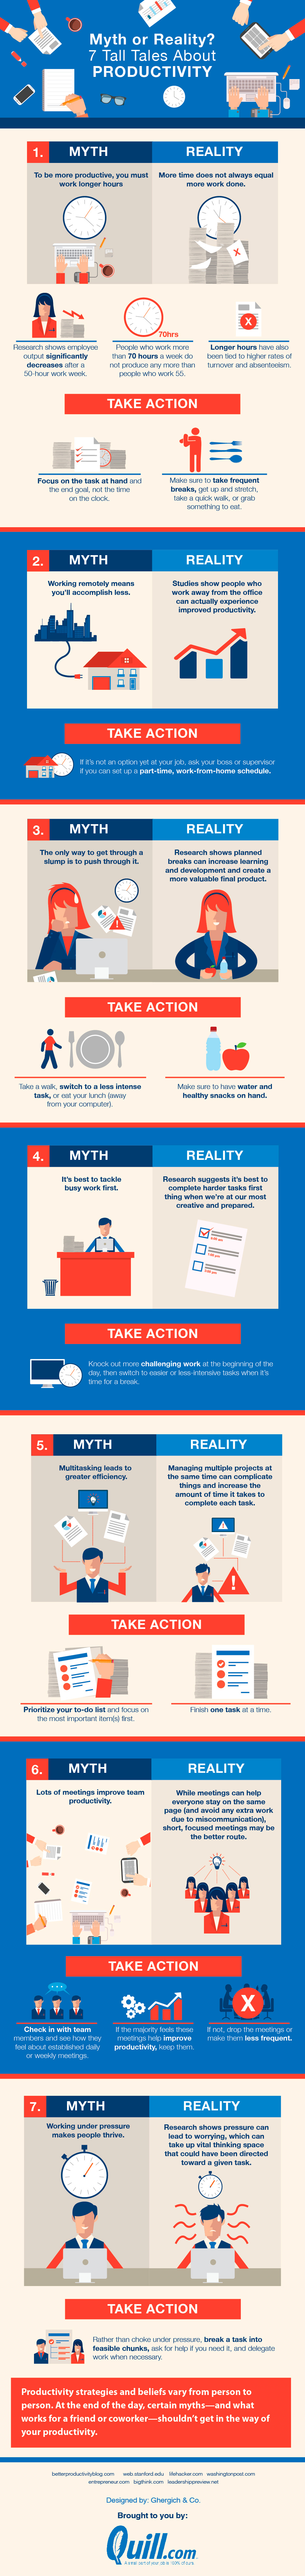 productivity-myths-and-reality